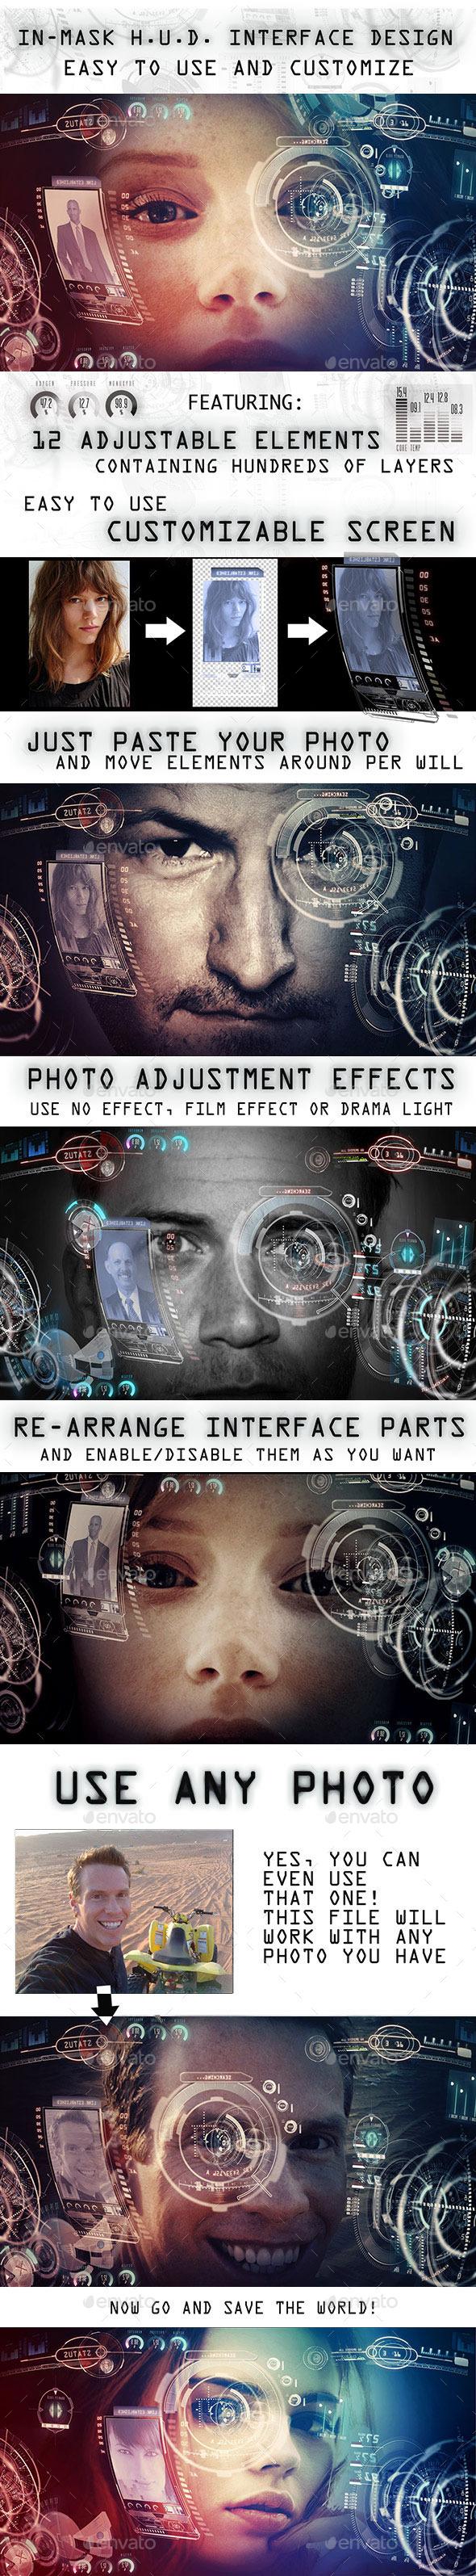 In Mask H.U.D. Interface Design Mock-up - Tech / Futuristic Backgrounds